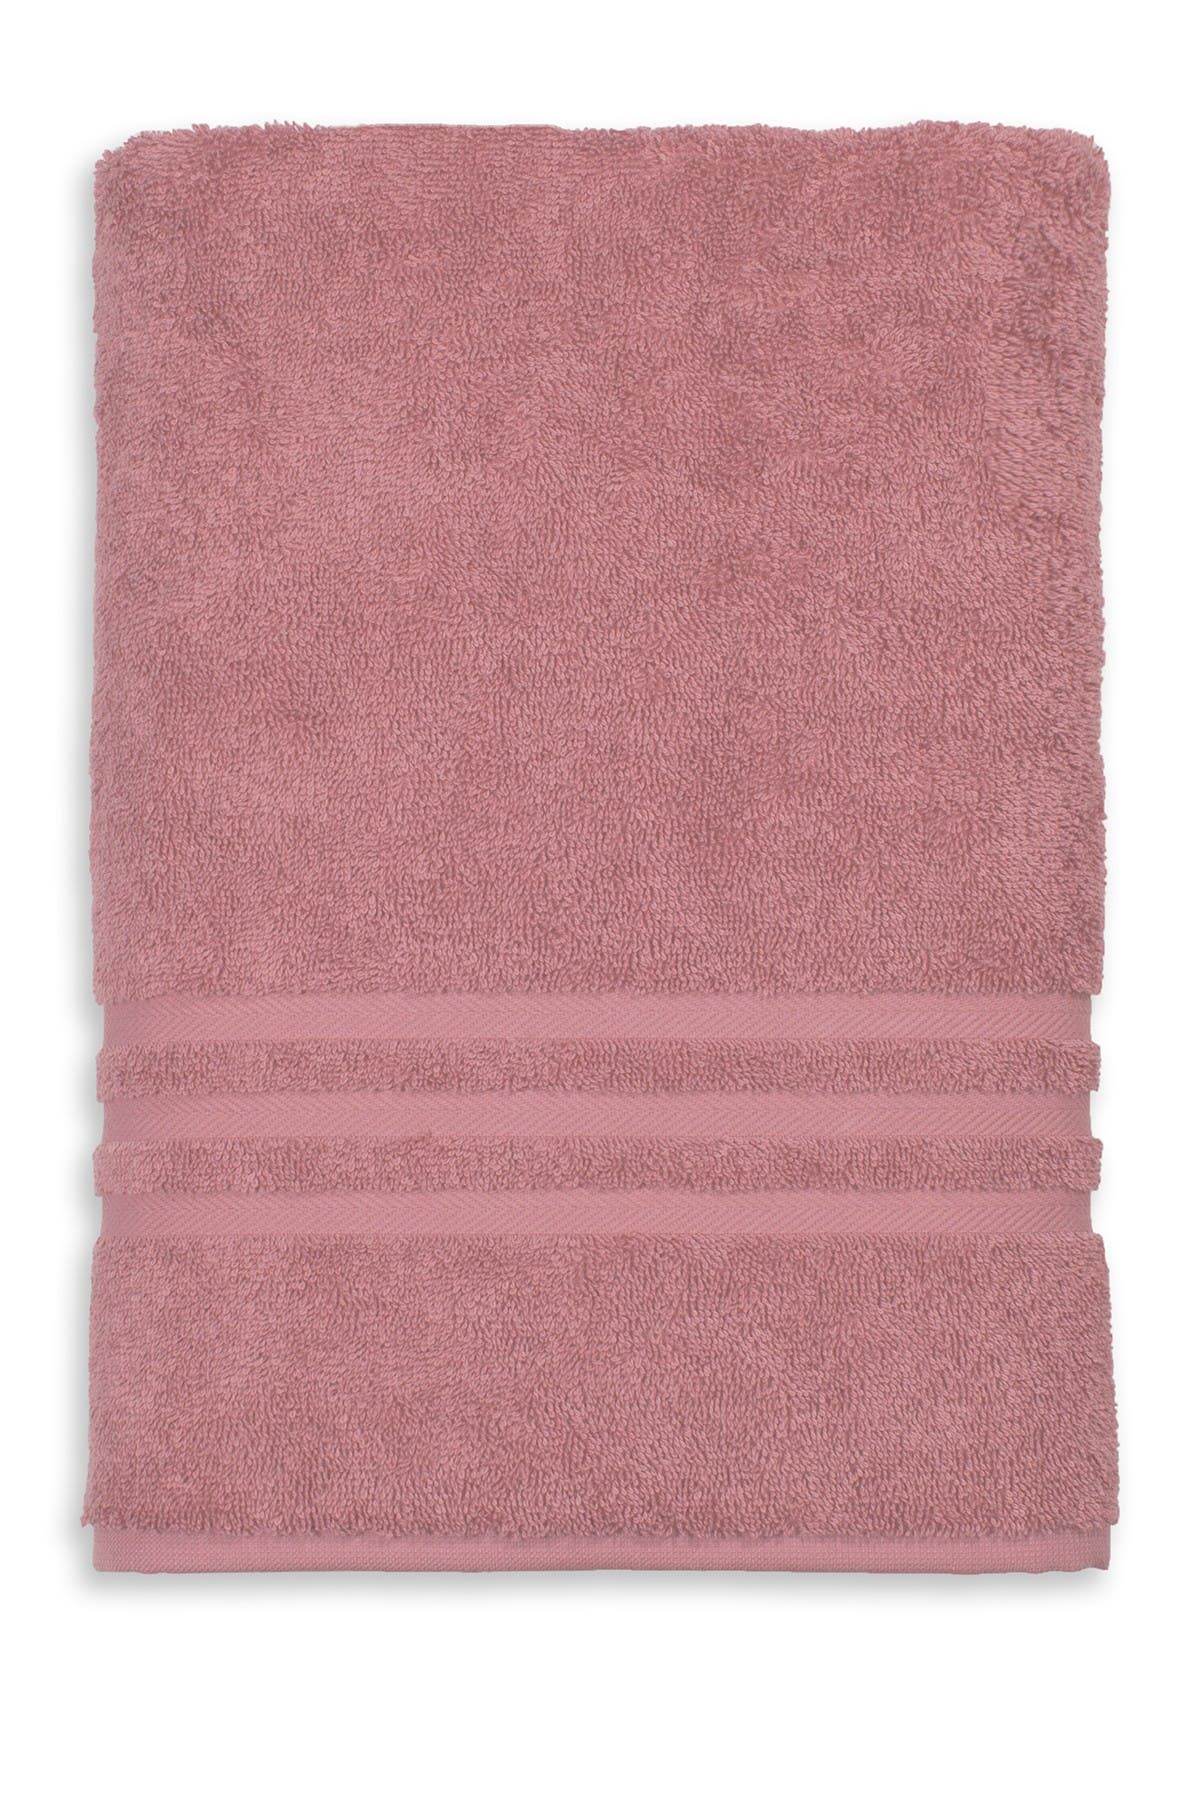 Image of LINUM HOME Denzi Bath Sheet - Tea Rose